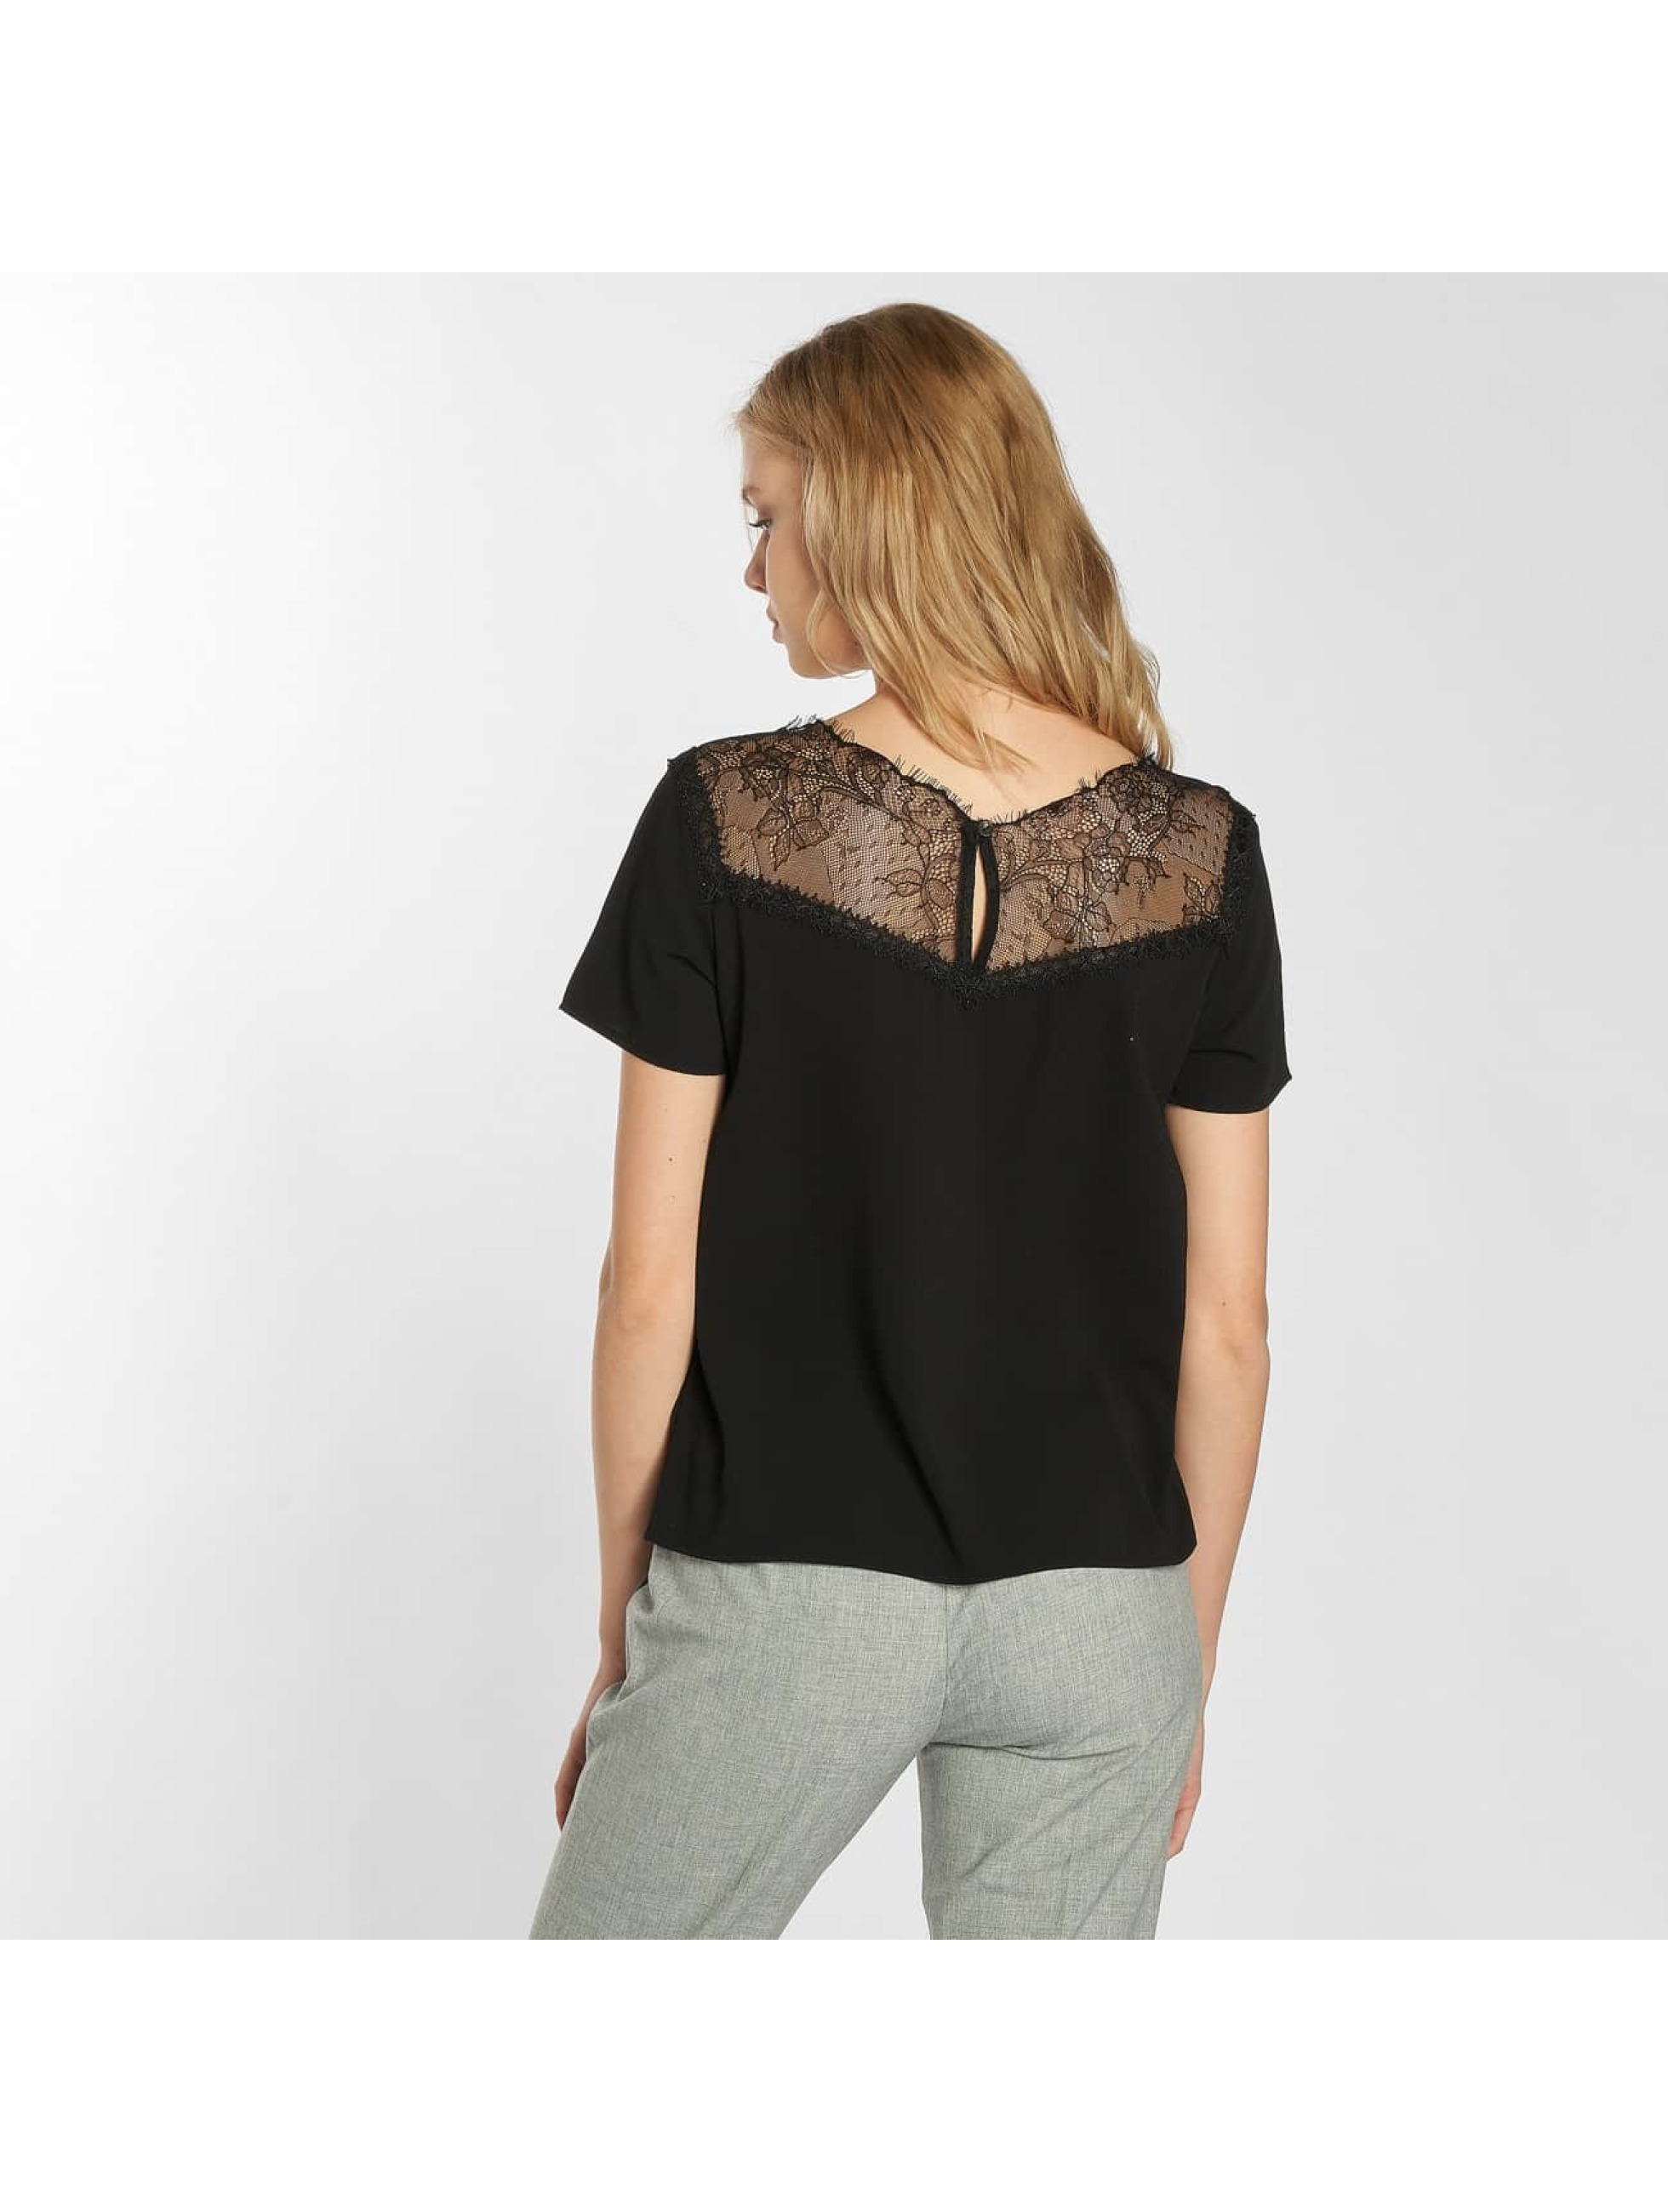 Grace & Mila T-Shirt Peluche schwarz